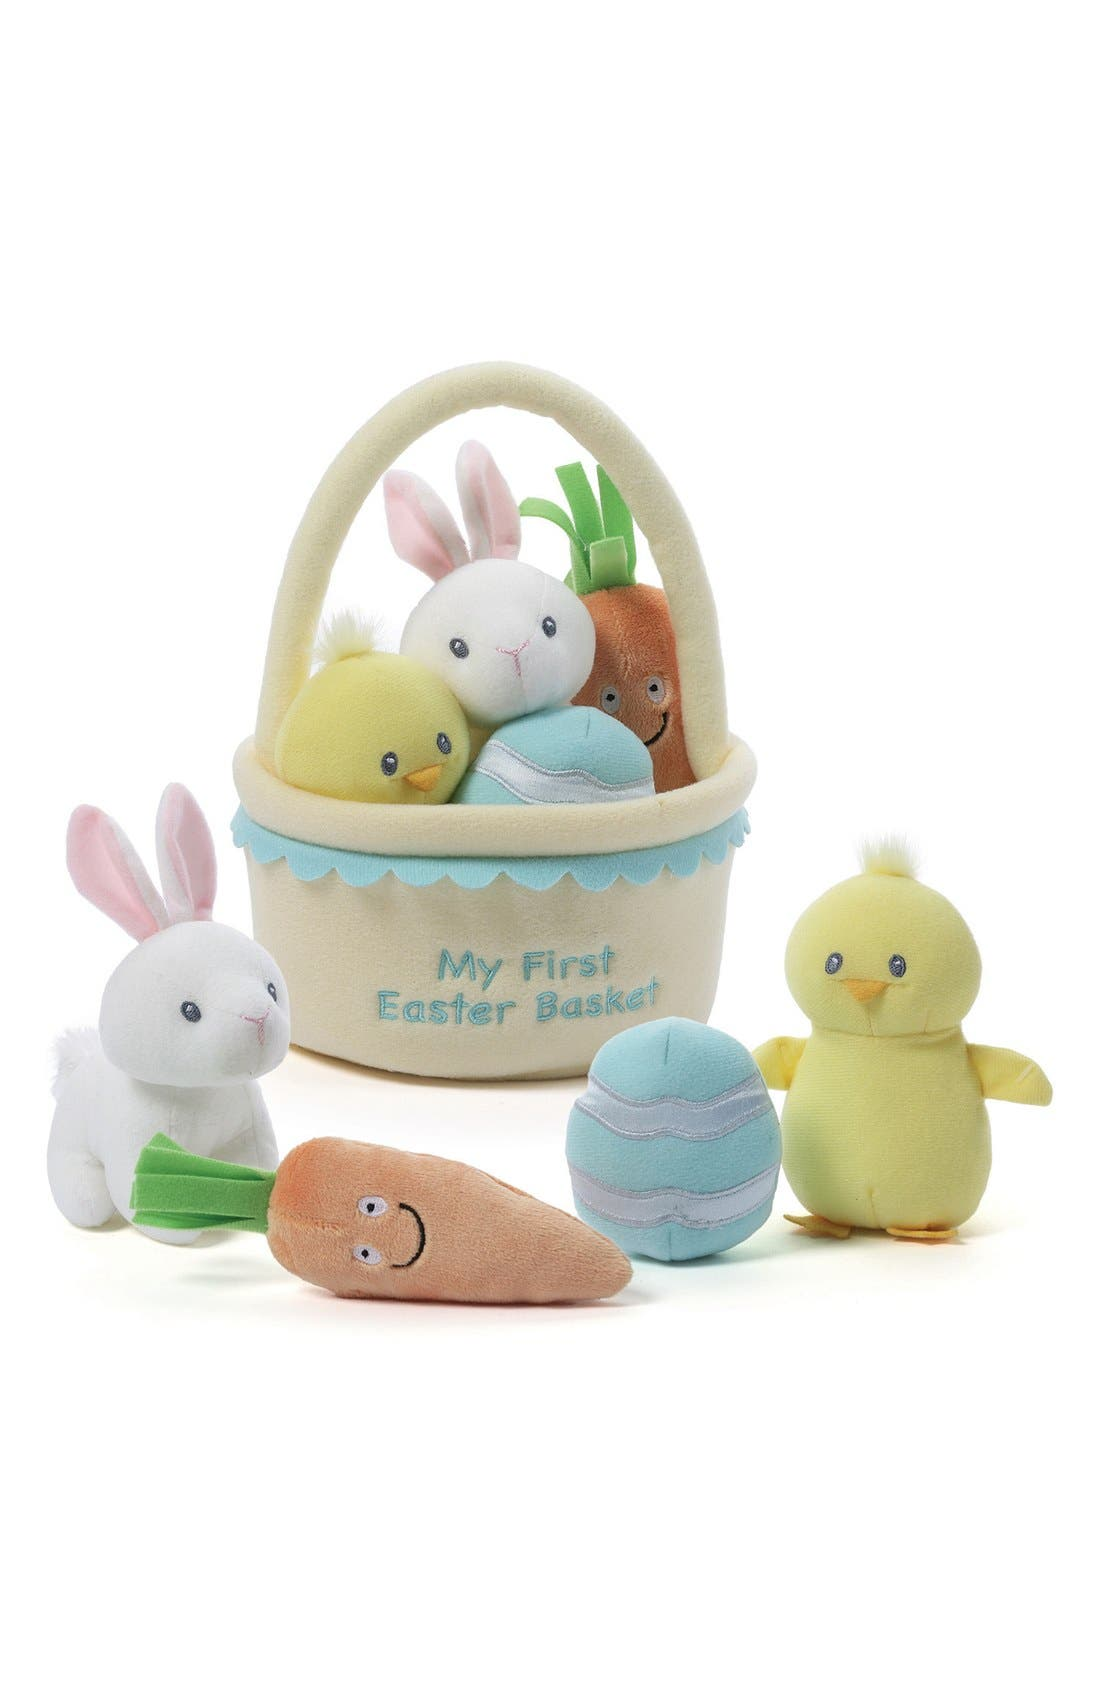 GUND,                             Baby Gund 'My First Easter Basket' Plush Play Set,                             Main thumbnail 1, color,                             YELLOW